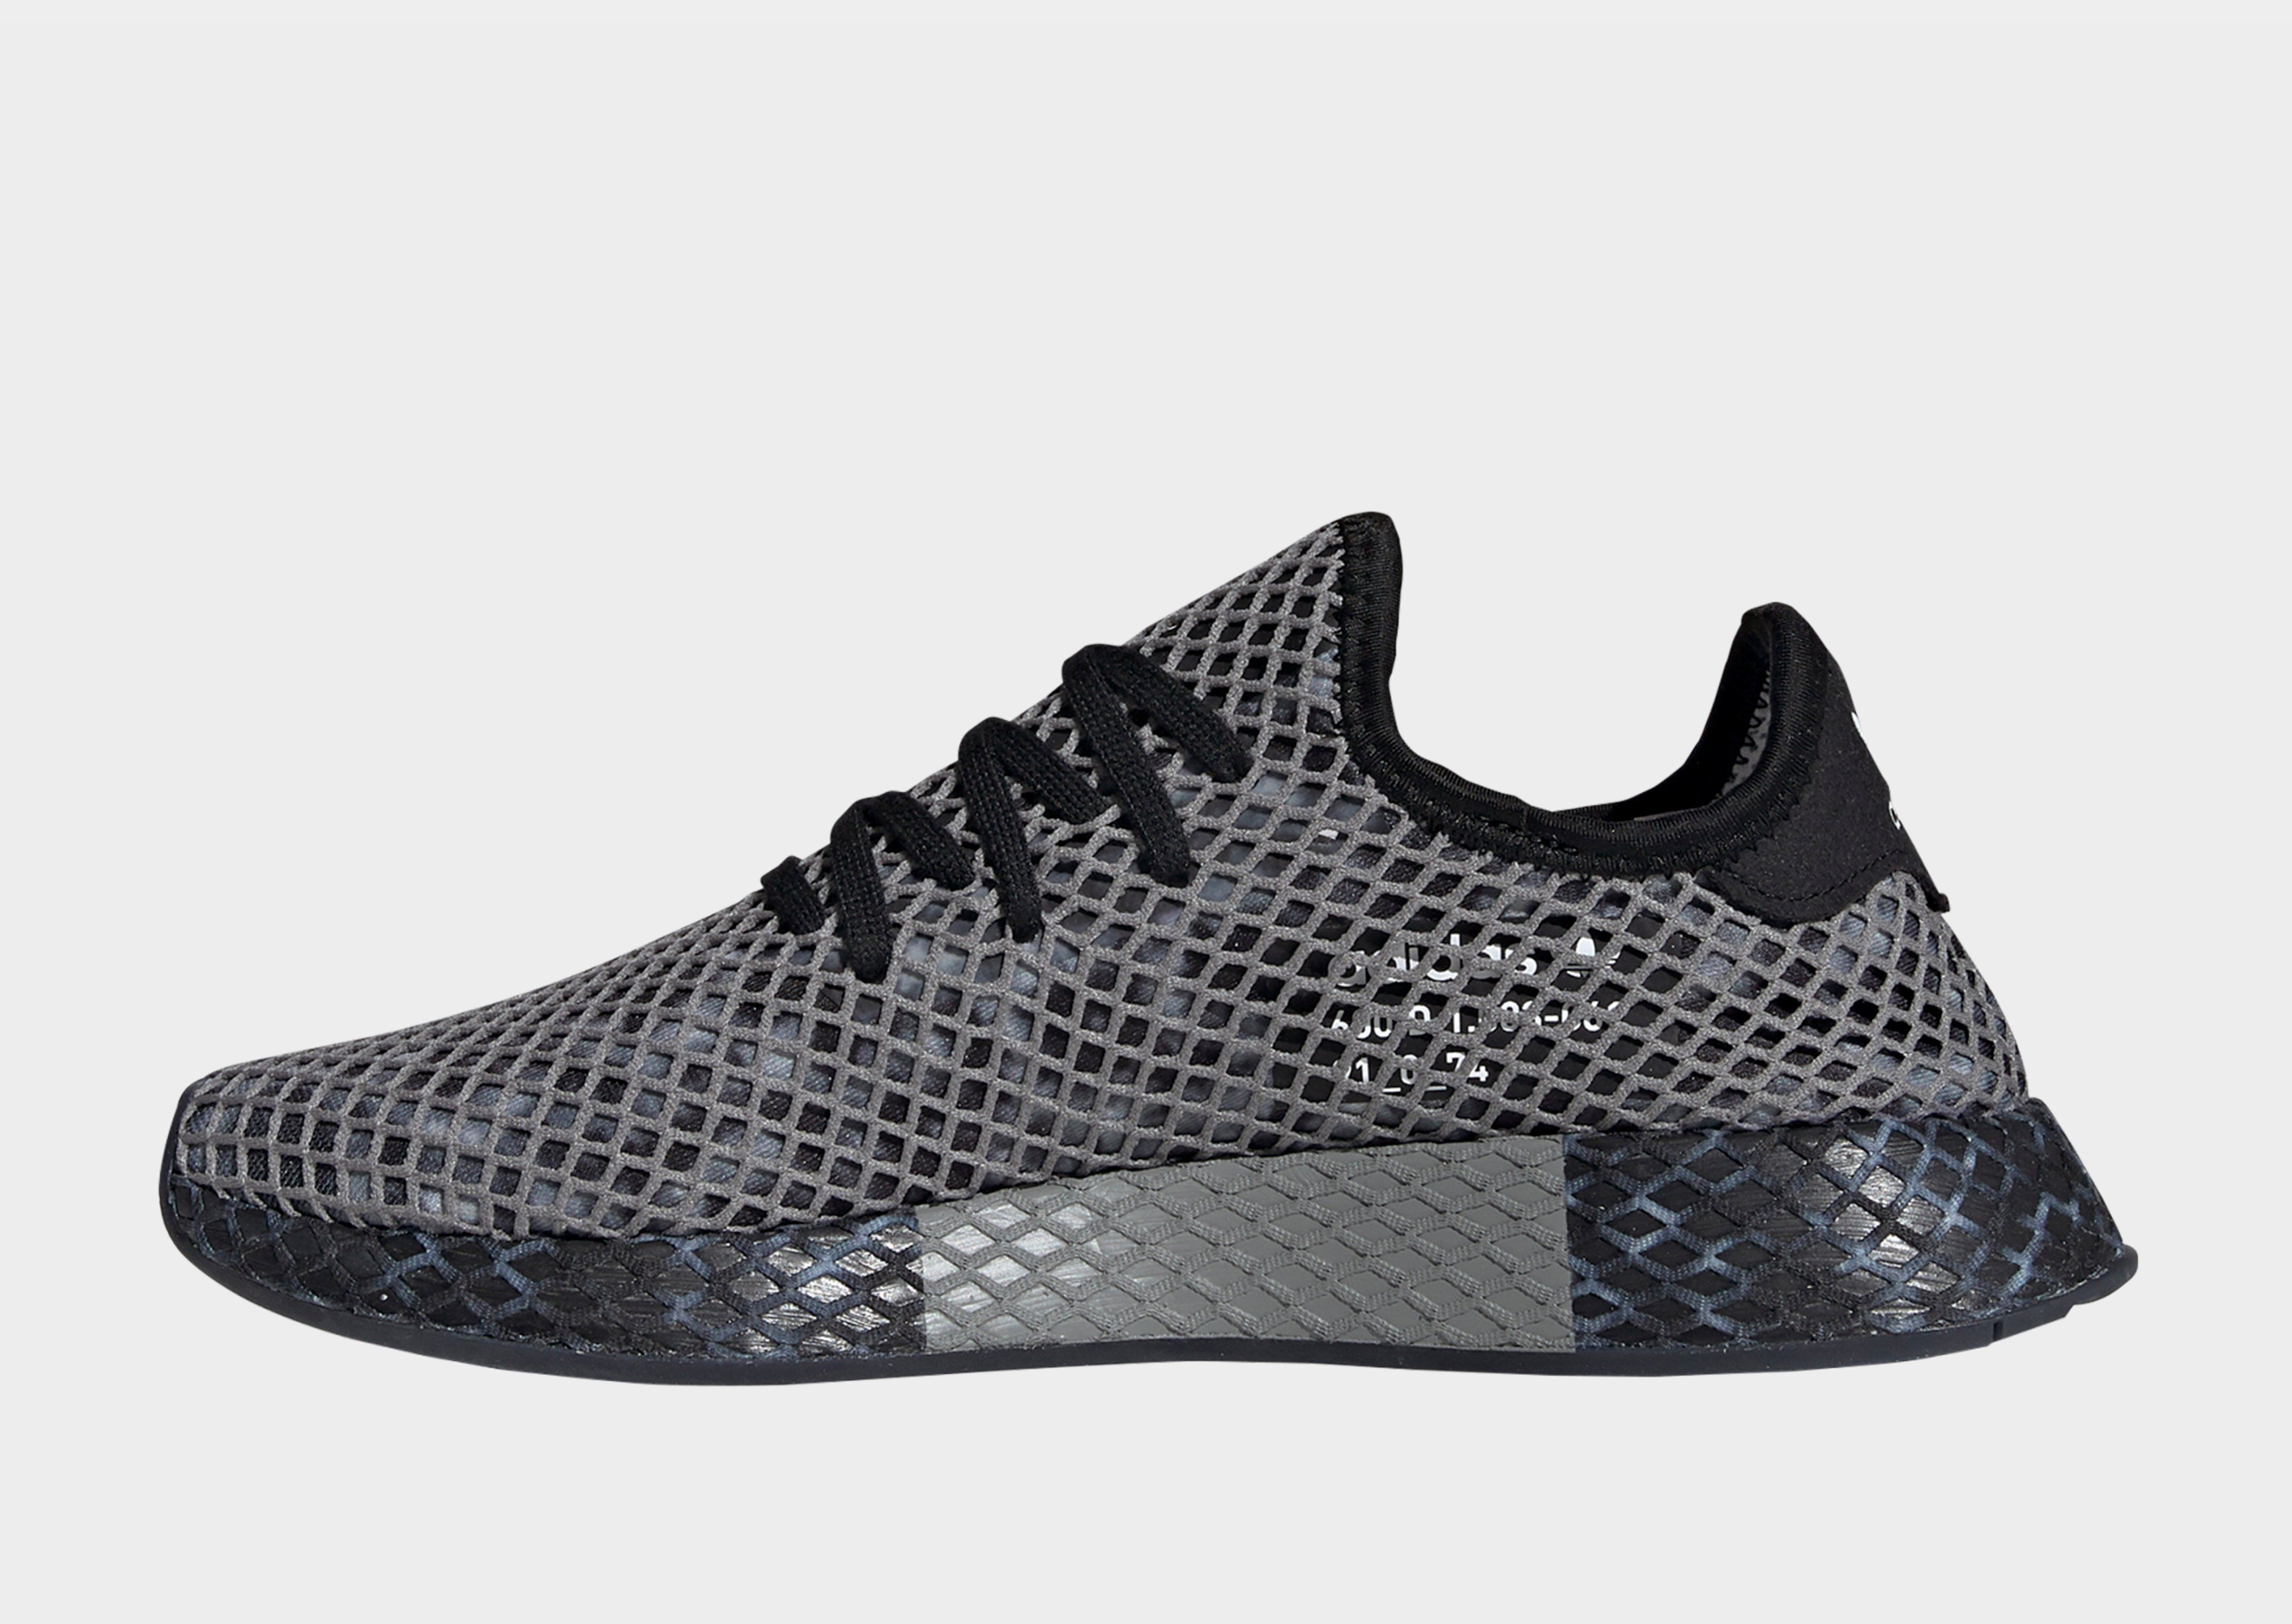 adidas Originals Deerupt Runner Shoes JD Sports    adidas Originals Deerupt Runner Shoes   title=          JD Sports